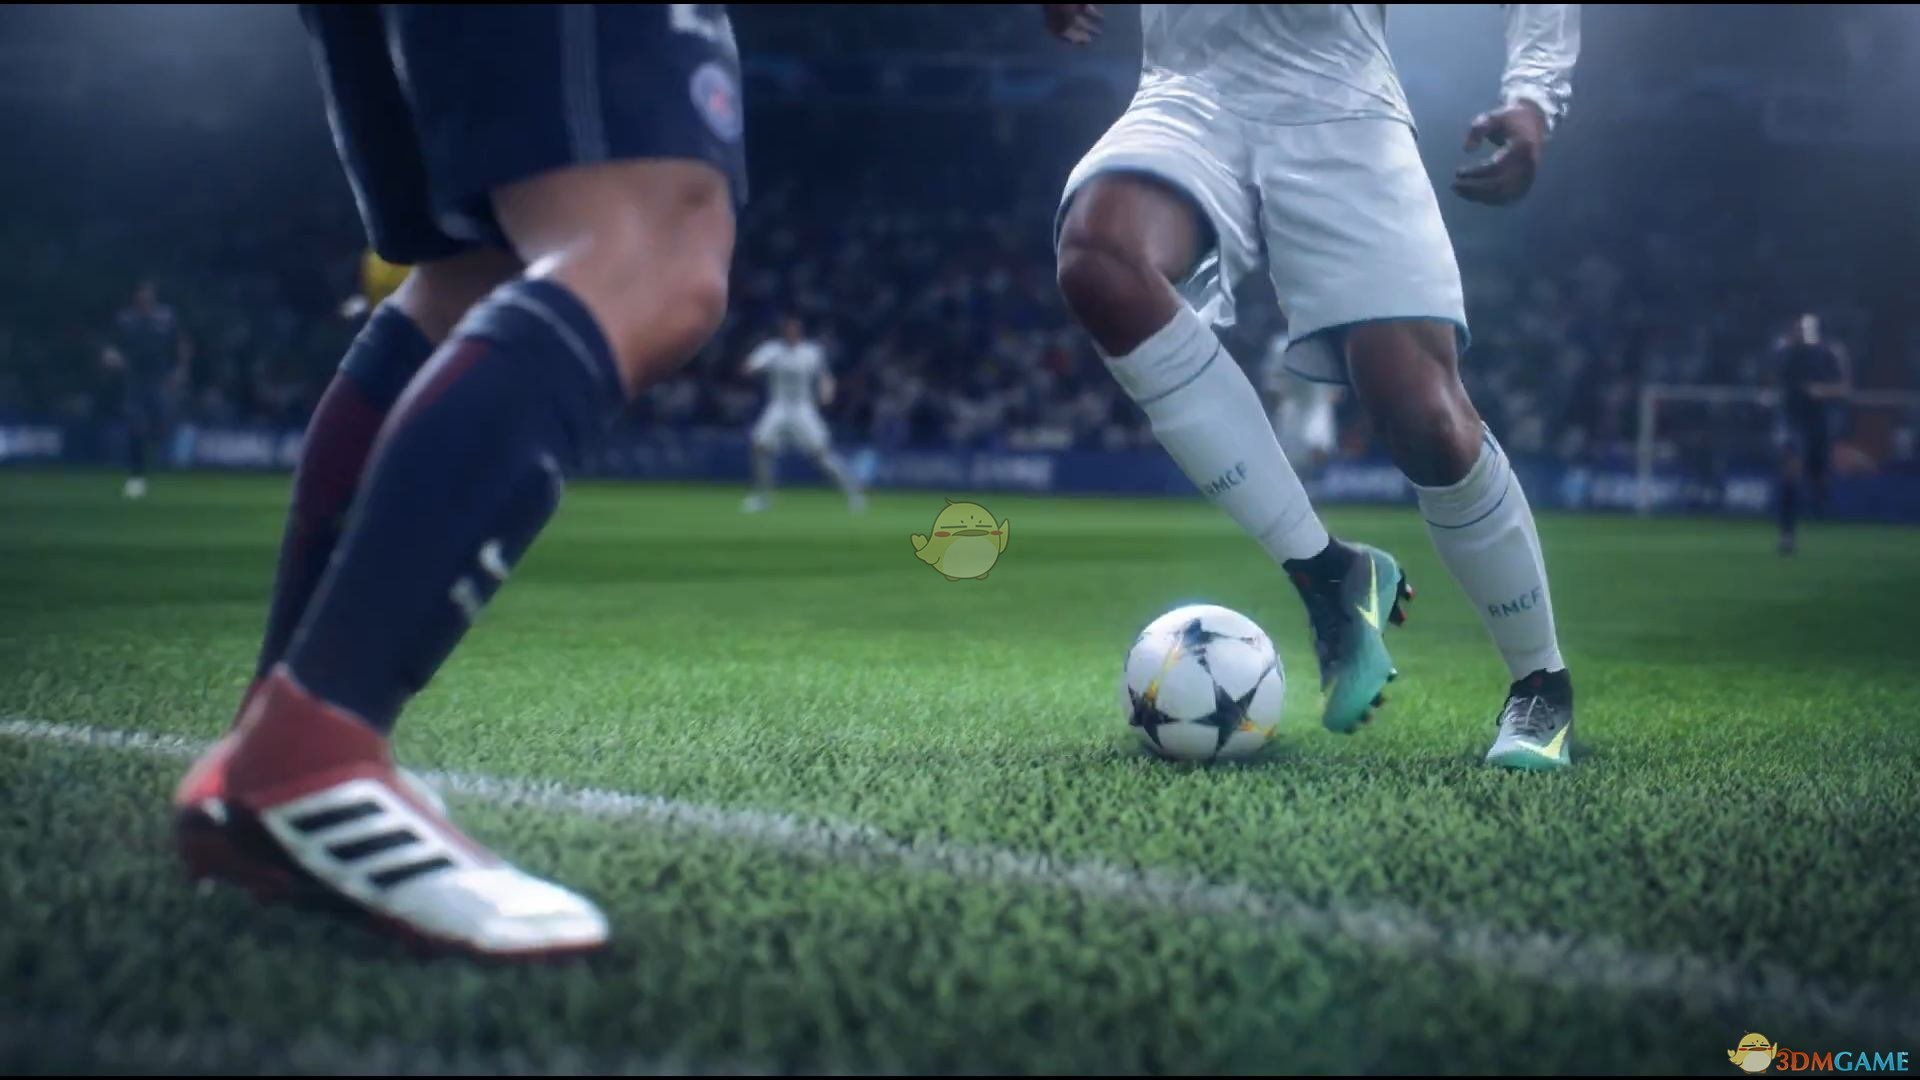 《FIFA 19》超值球员推荐